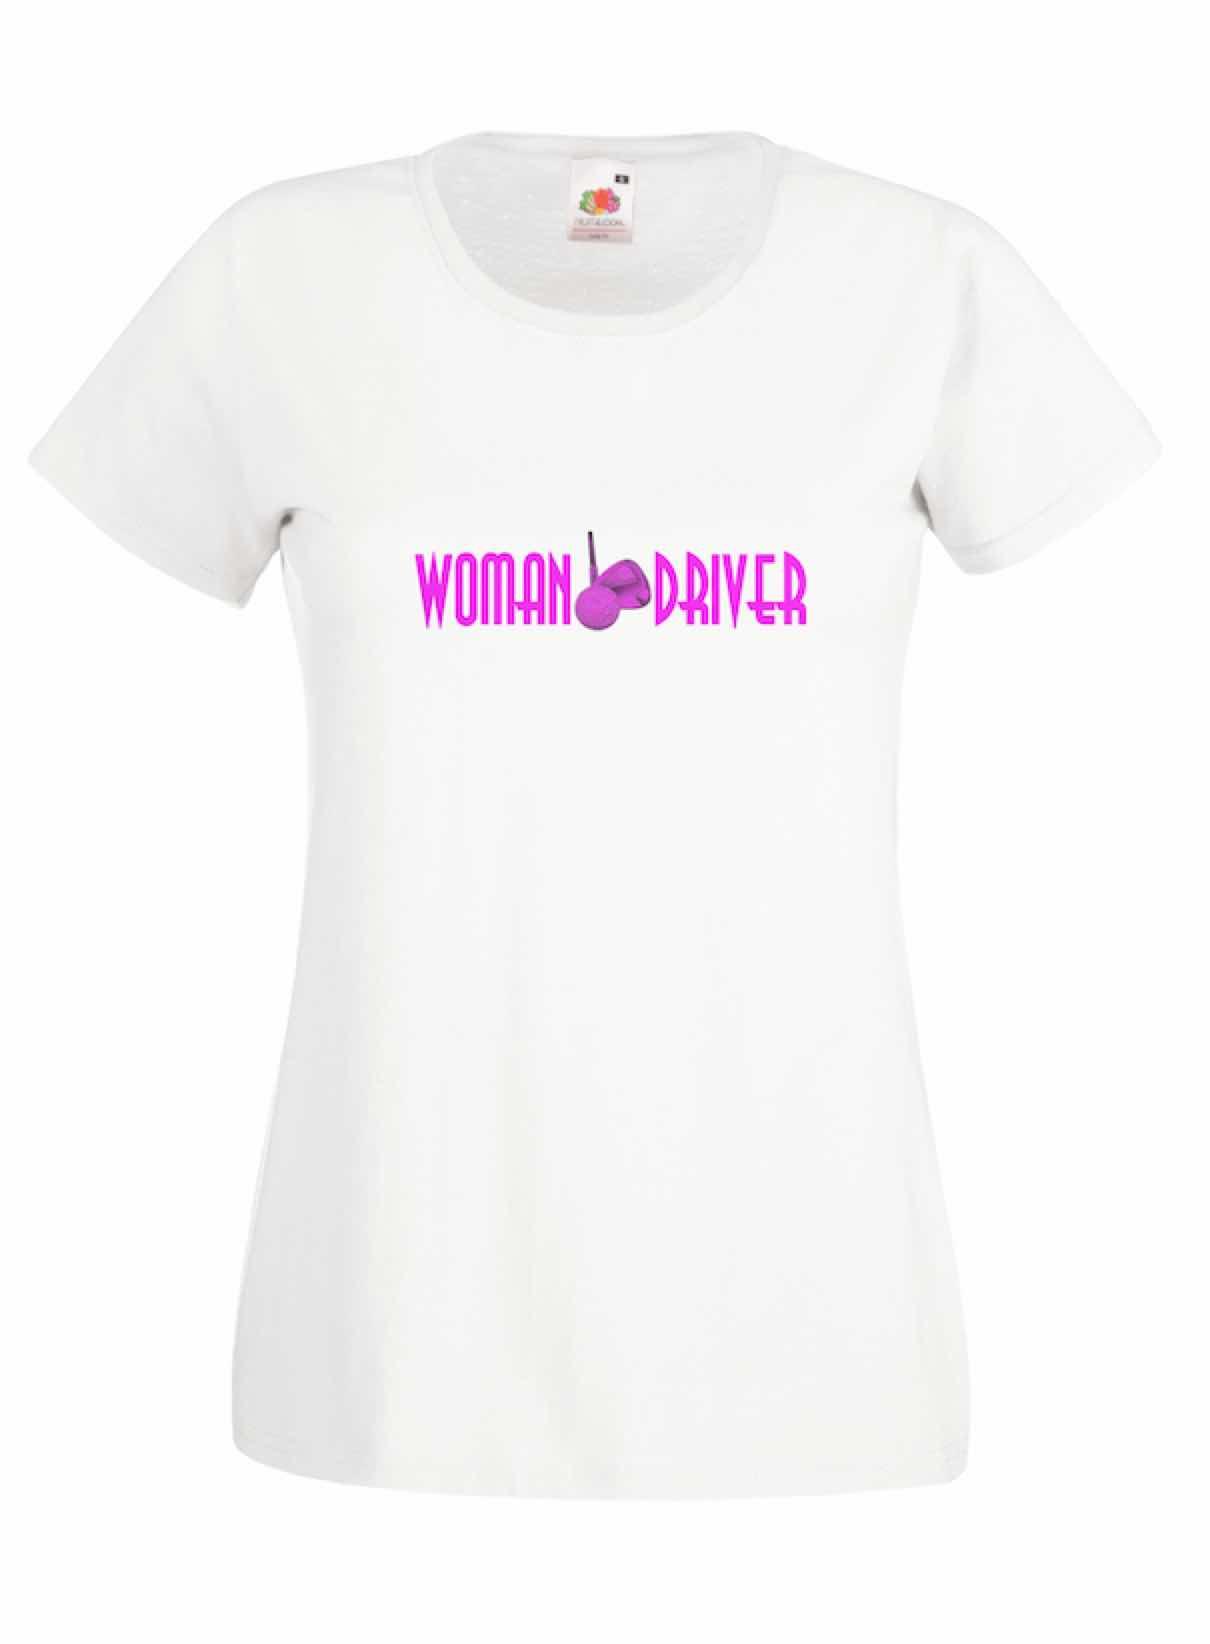 Woman Driver design for t-shirt, hoodie & sweatshirt